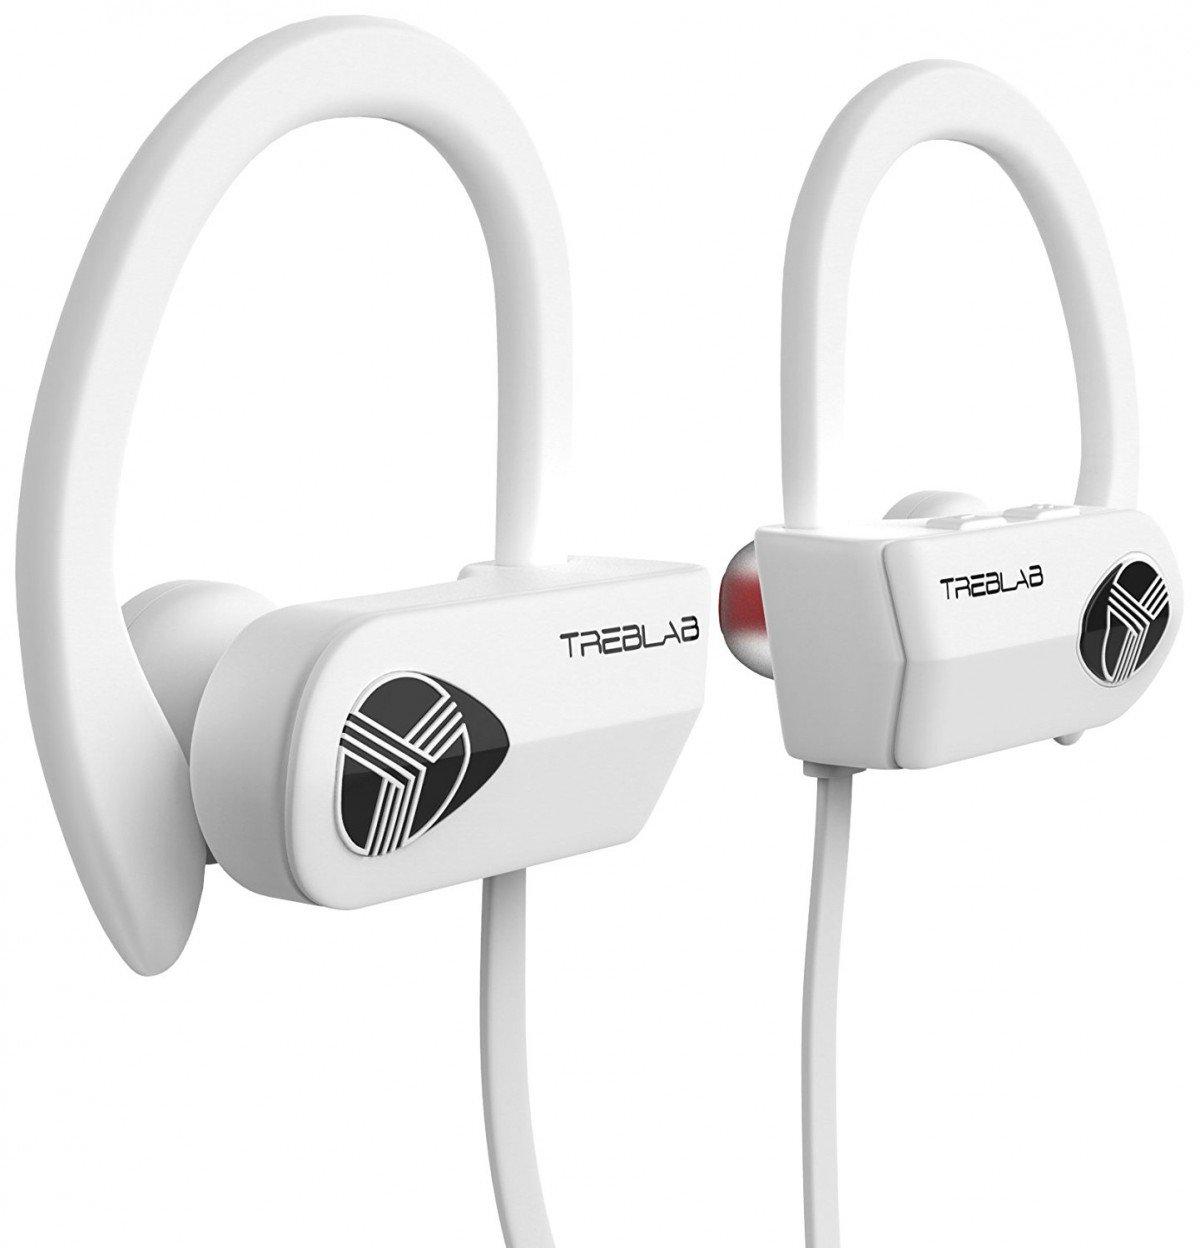 treblab xr500 bluetooth earbuds true hd sound 9 hour battery microphone ebay. Black Bedroom Furniture Sets. Home Design Ideas